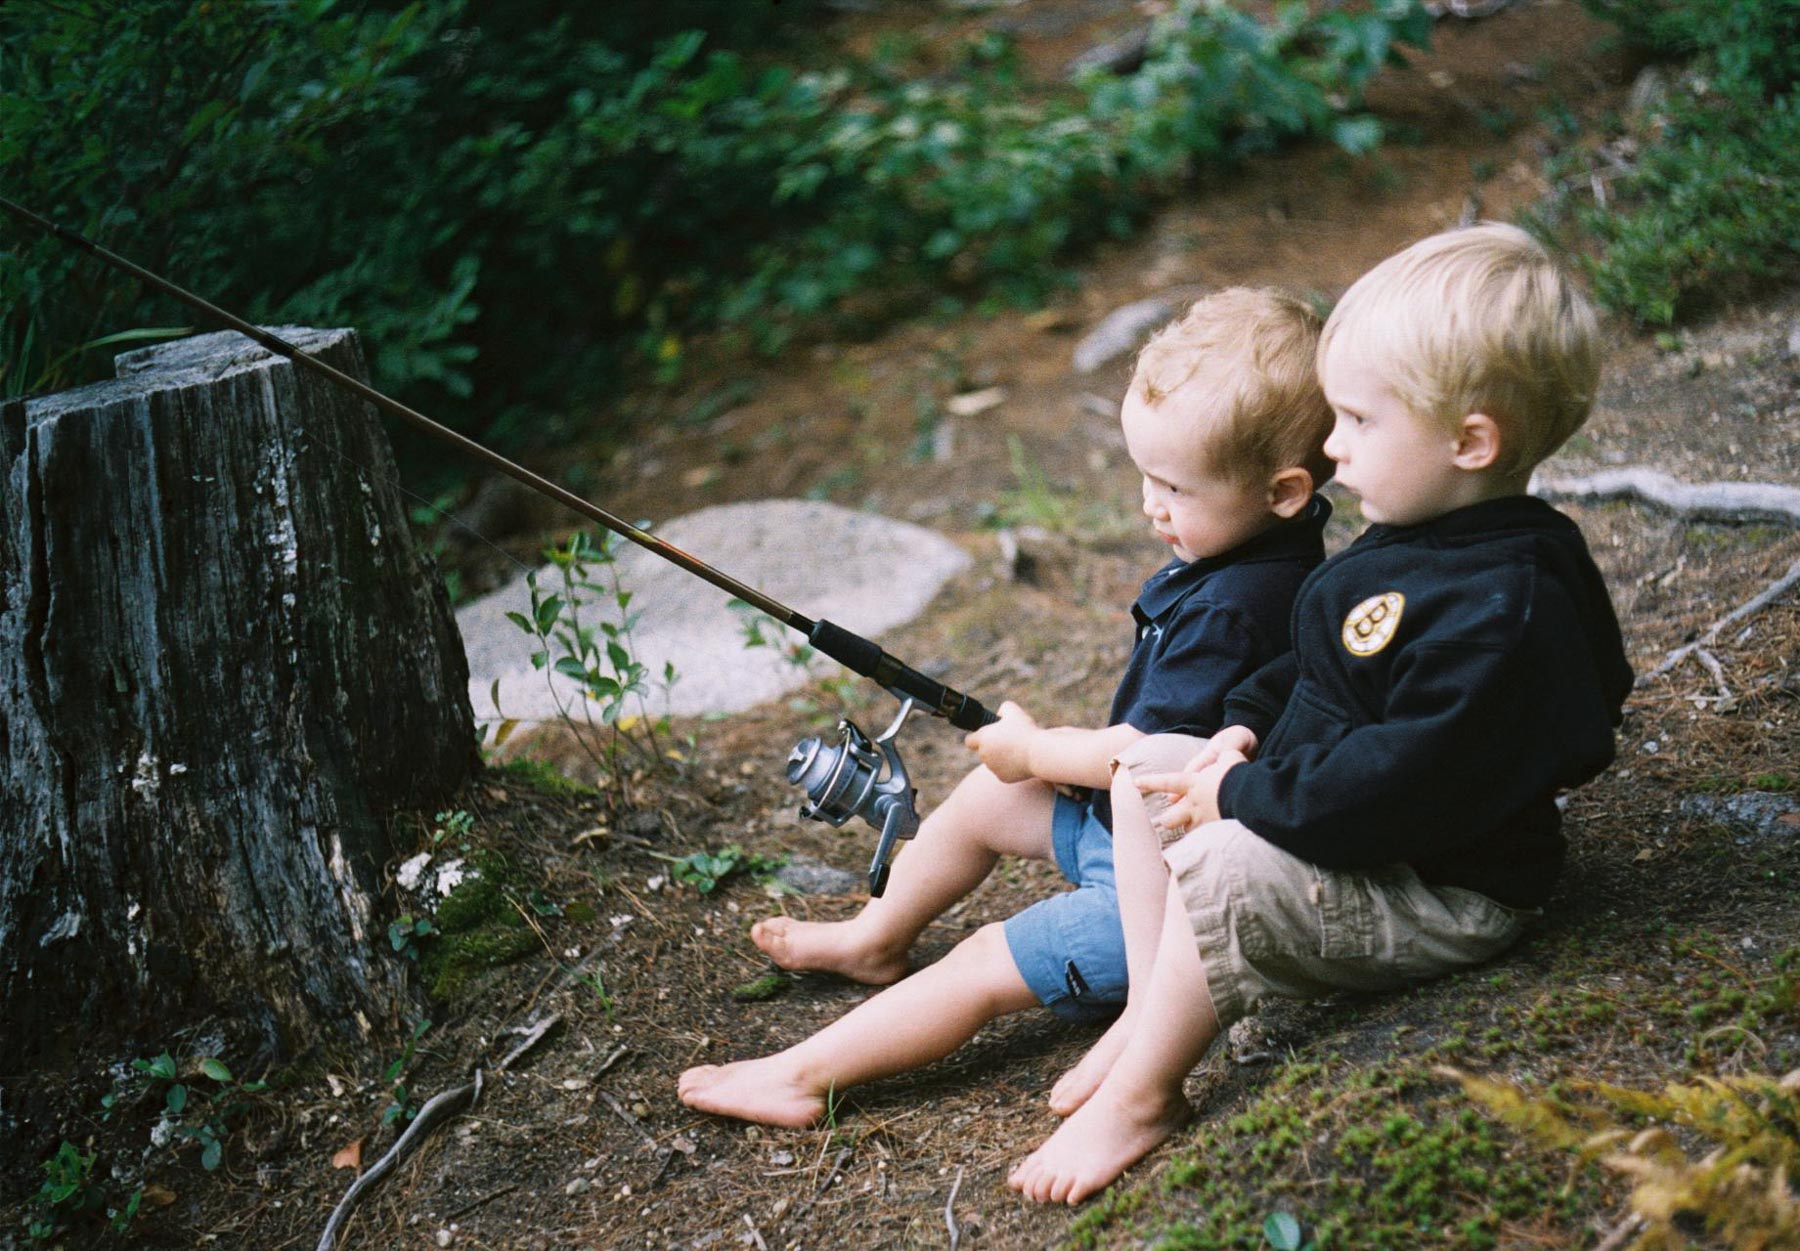 FishingWithDad_CanonTL50mm_JenniferBattis.jpg